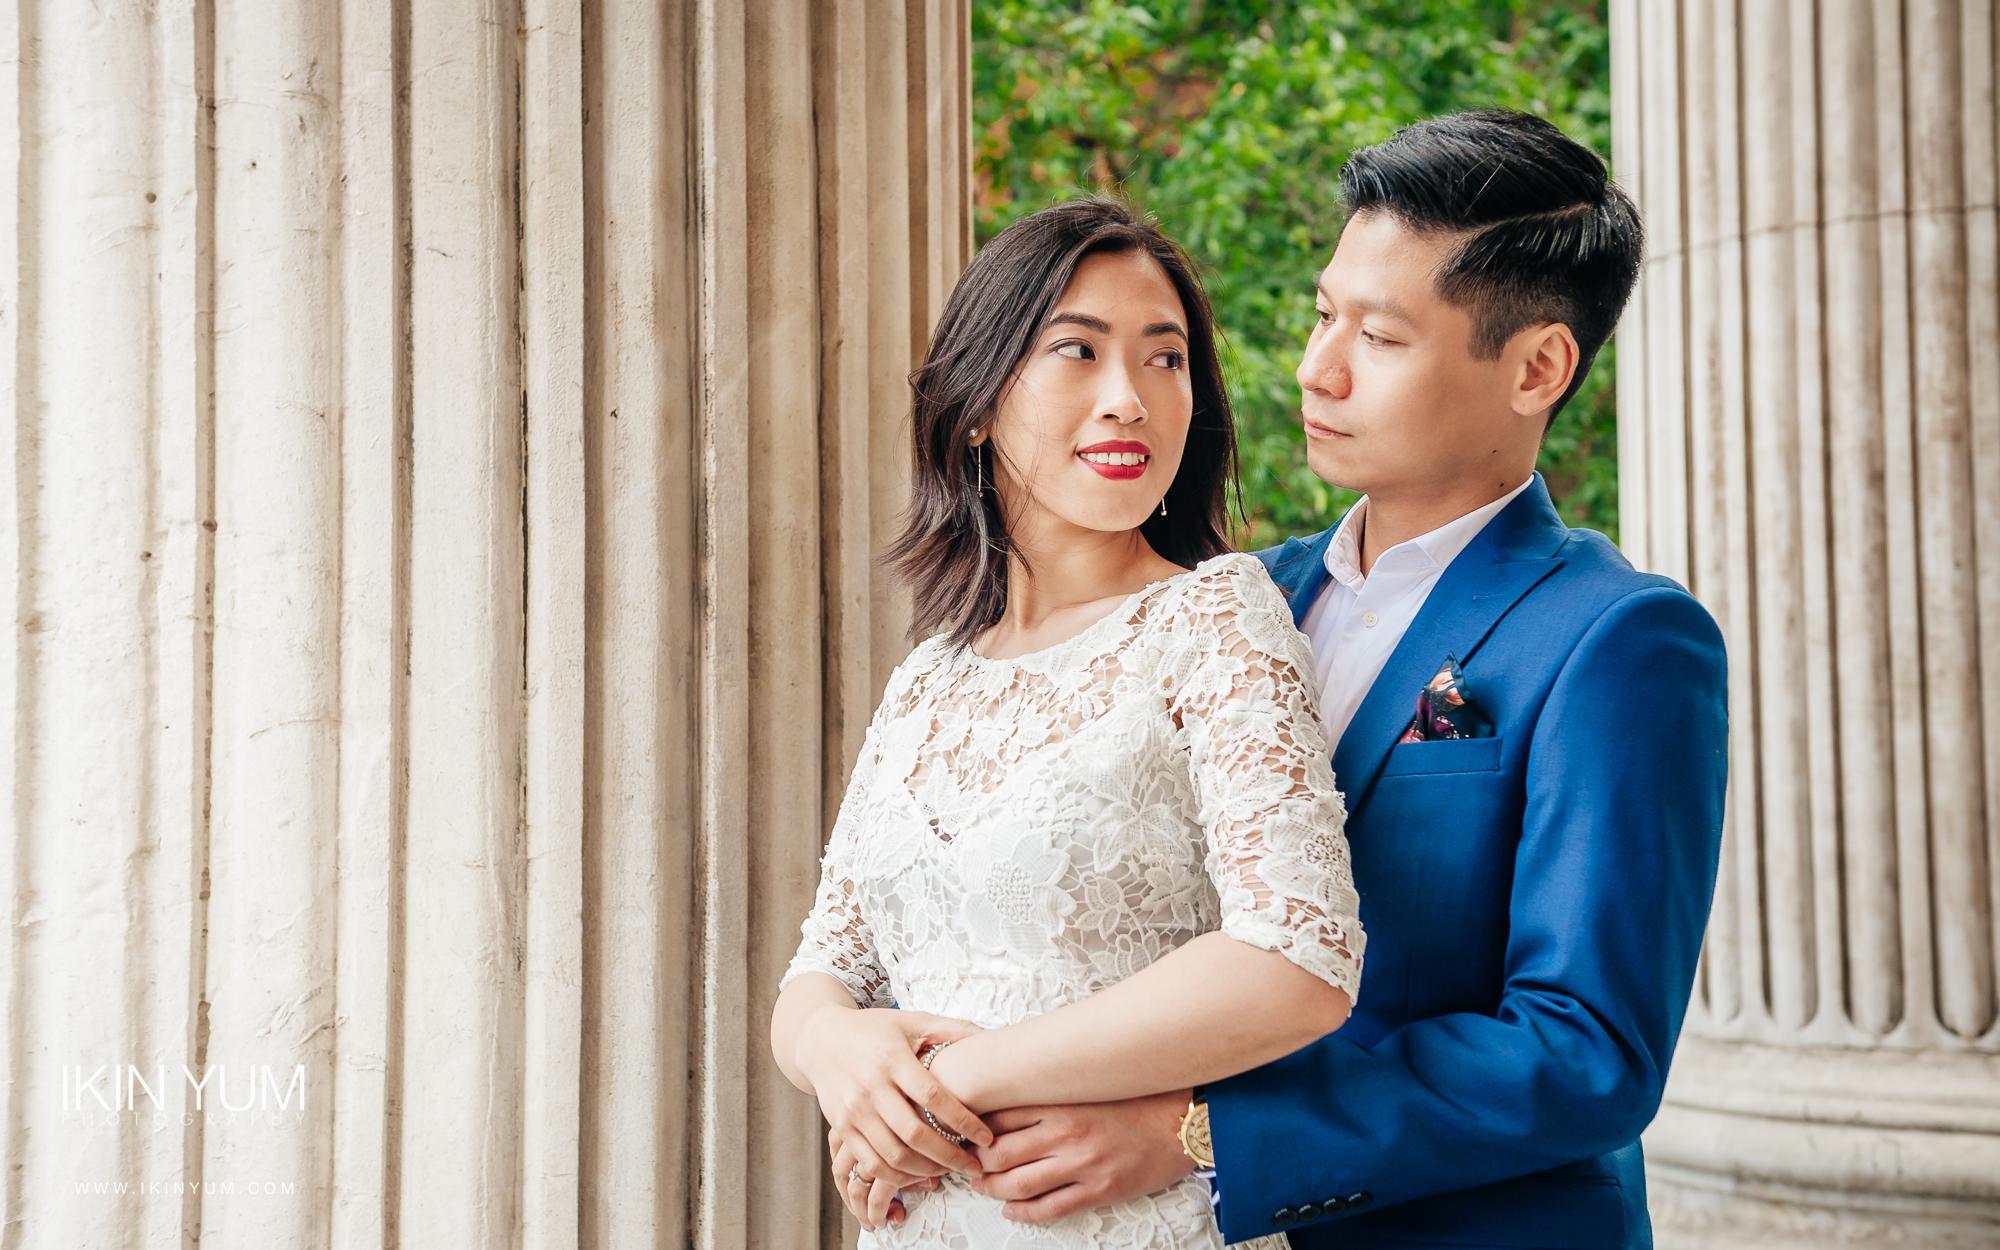 Natalie & Duncan Wedding Day - Ikin Yum Photography-124.jpg